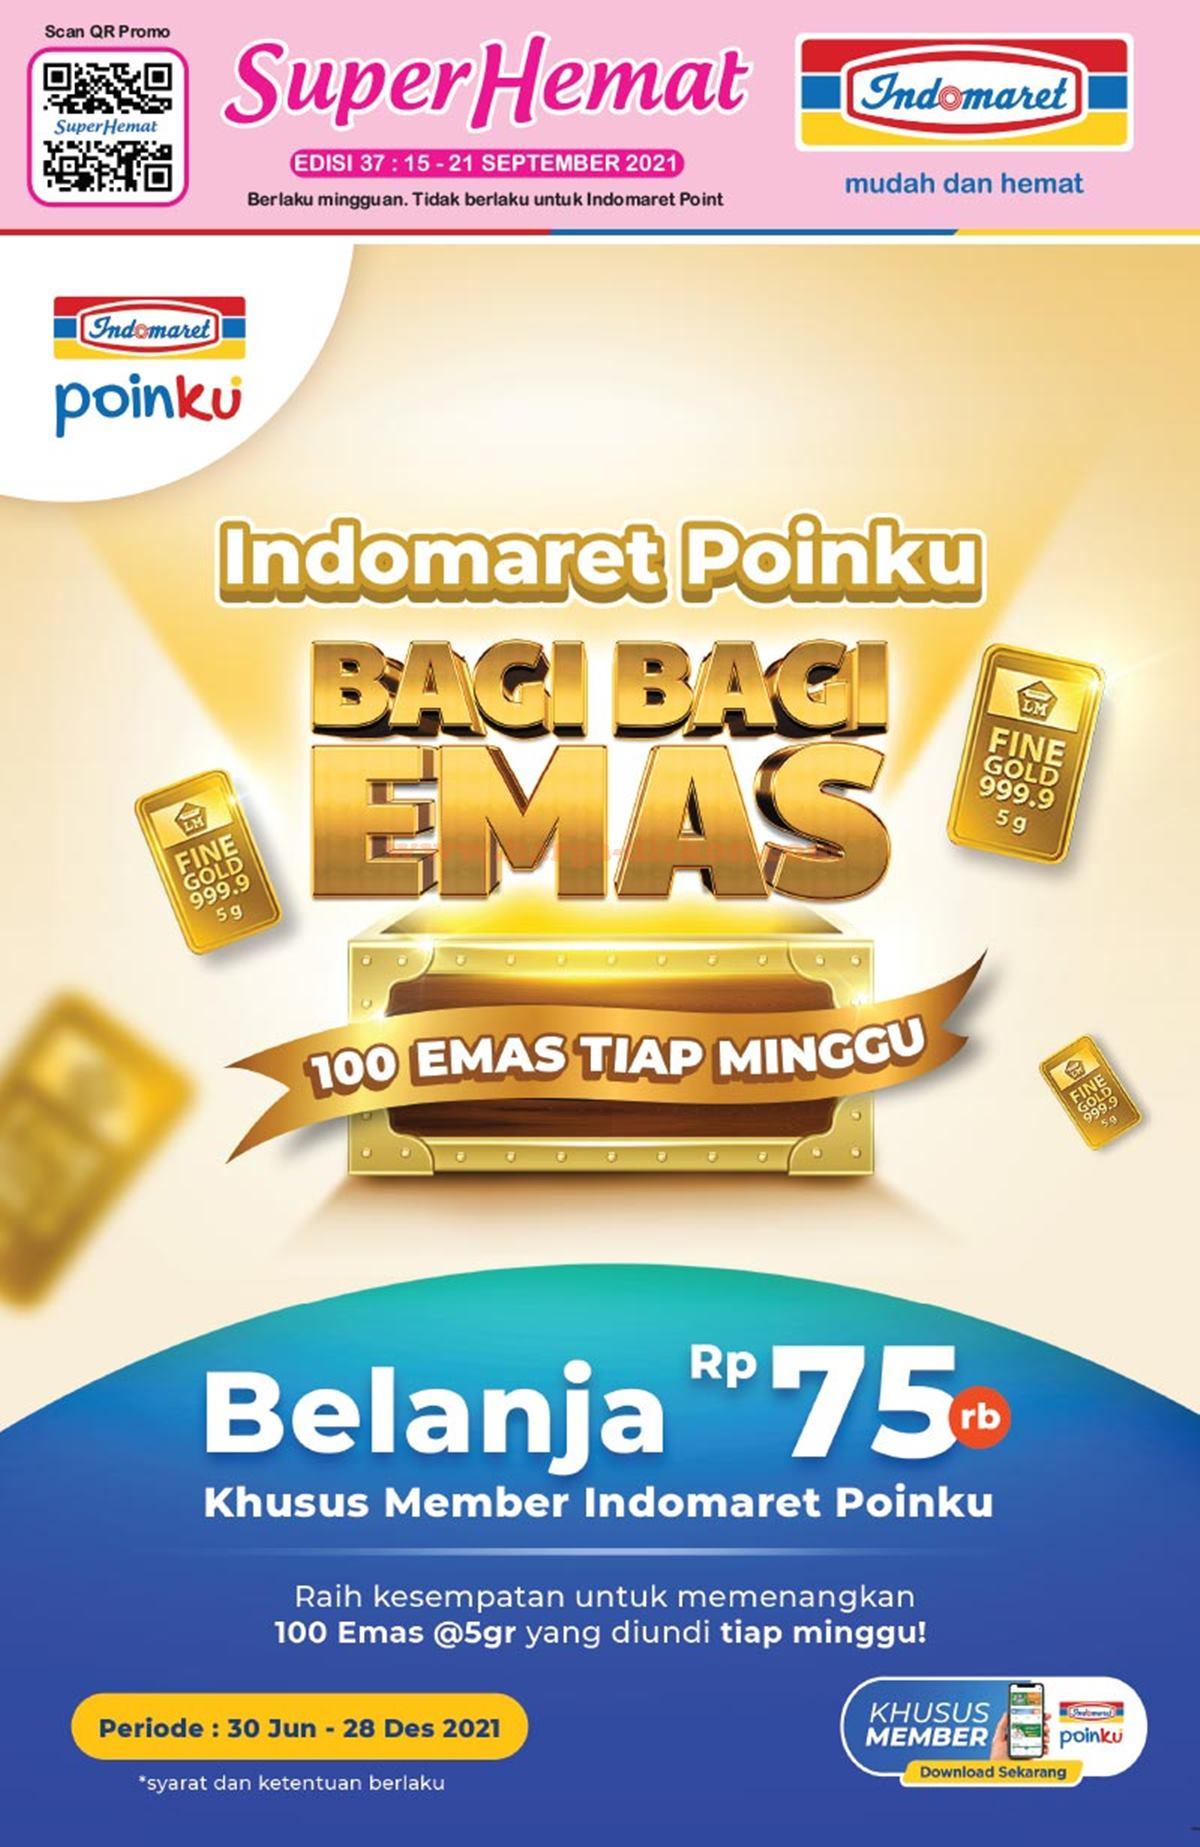 Katalog Promo INDOMARET Terbaru 15 - 21 September 2021